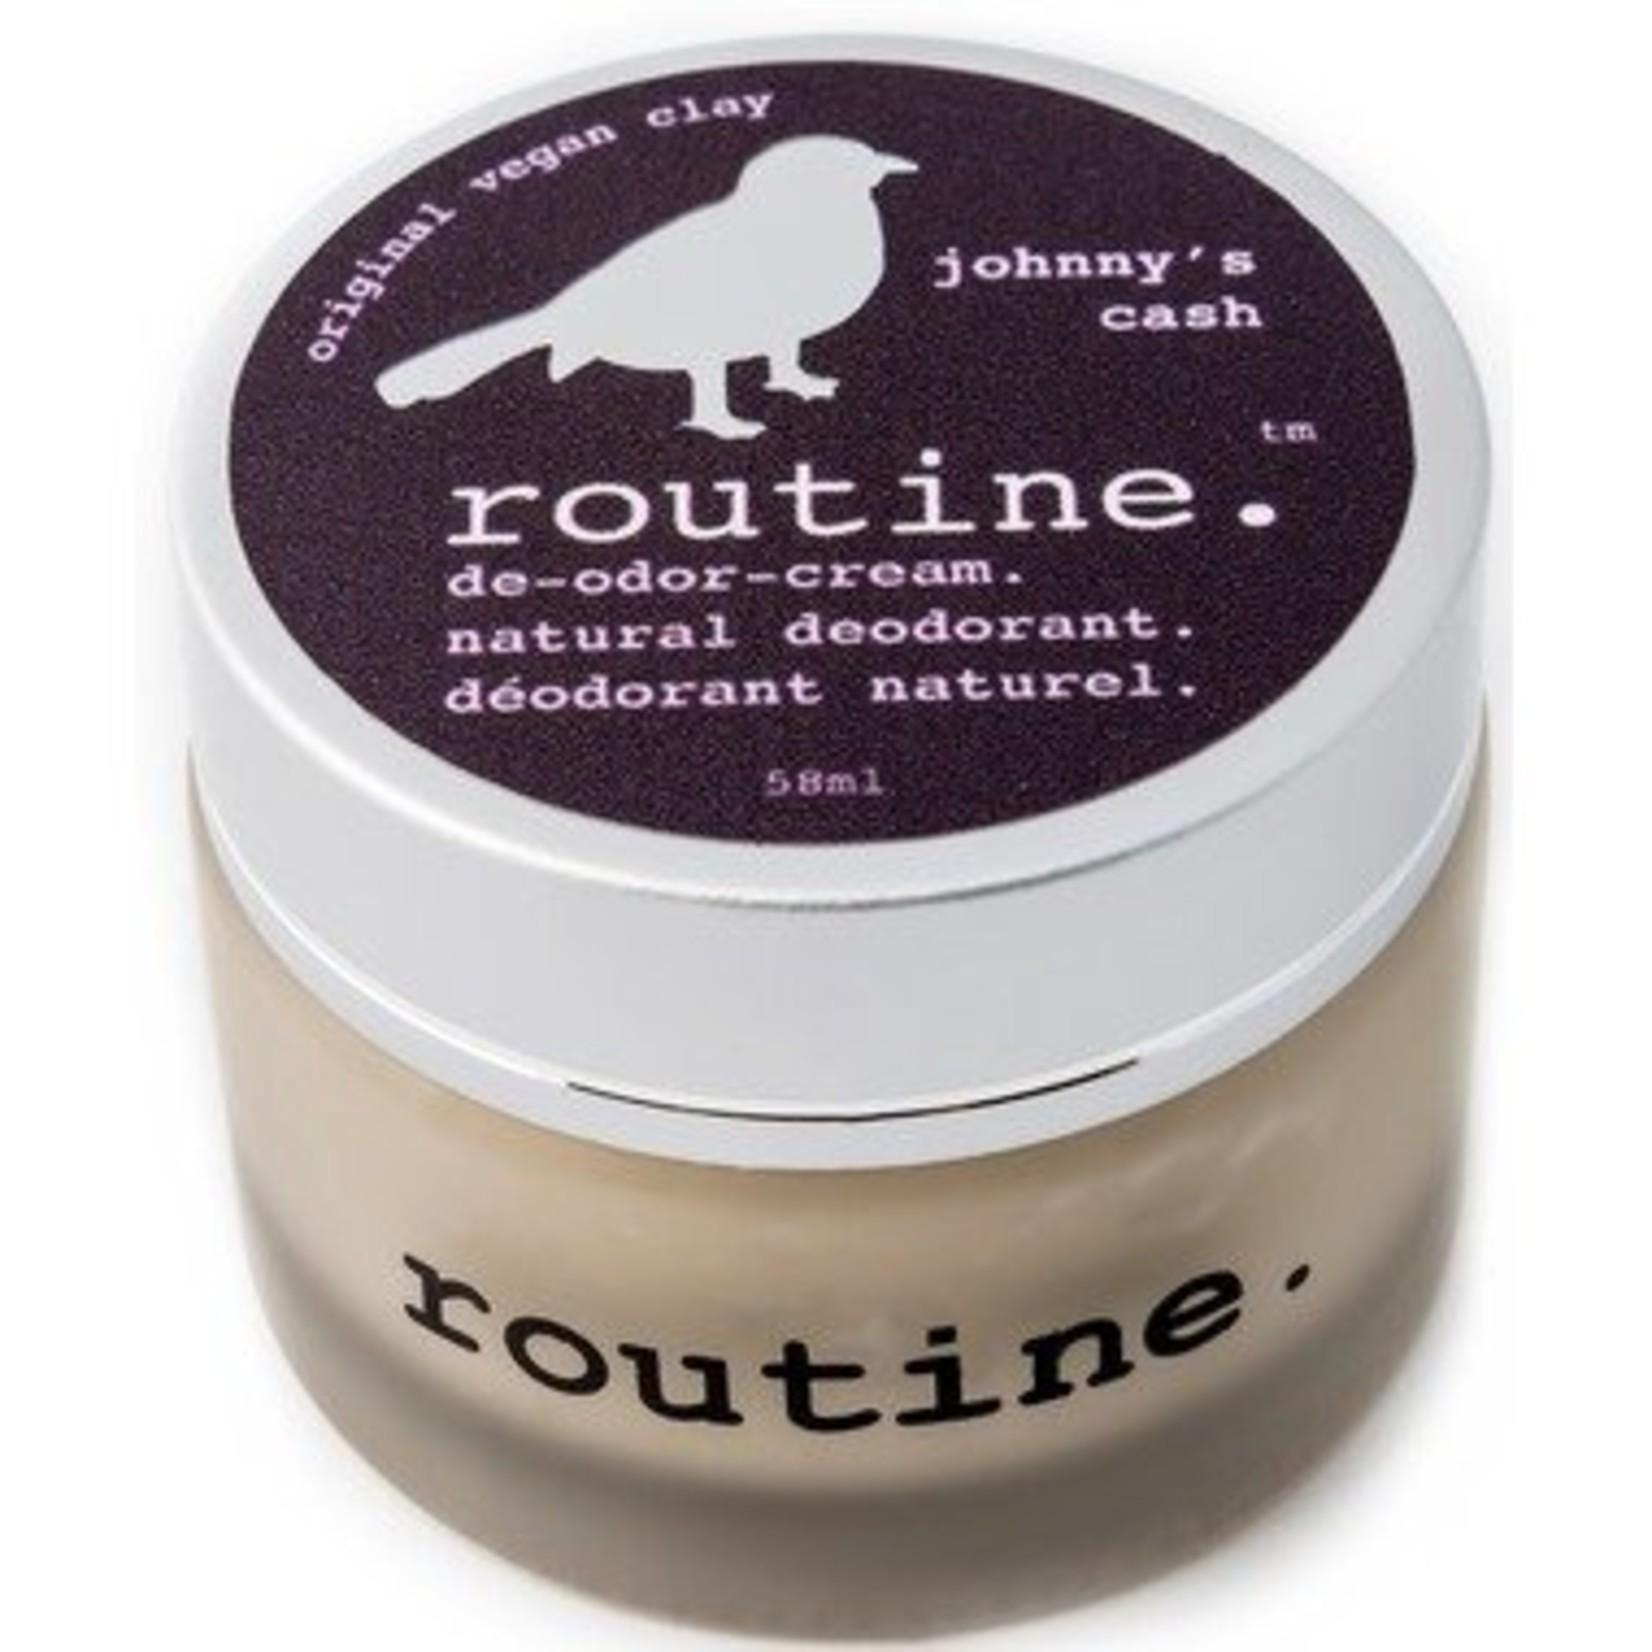 Routine Natural Deodorant Johnny's Cash 58ml